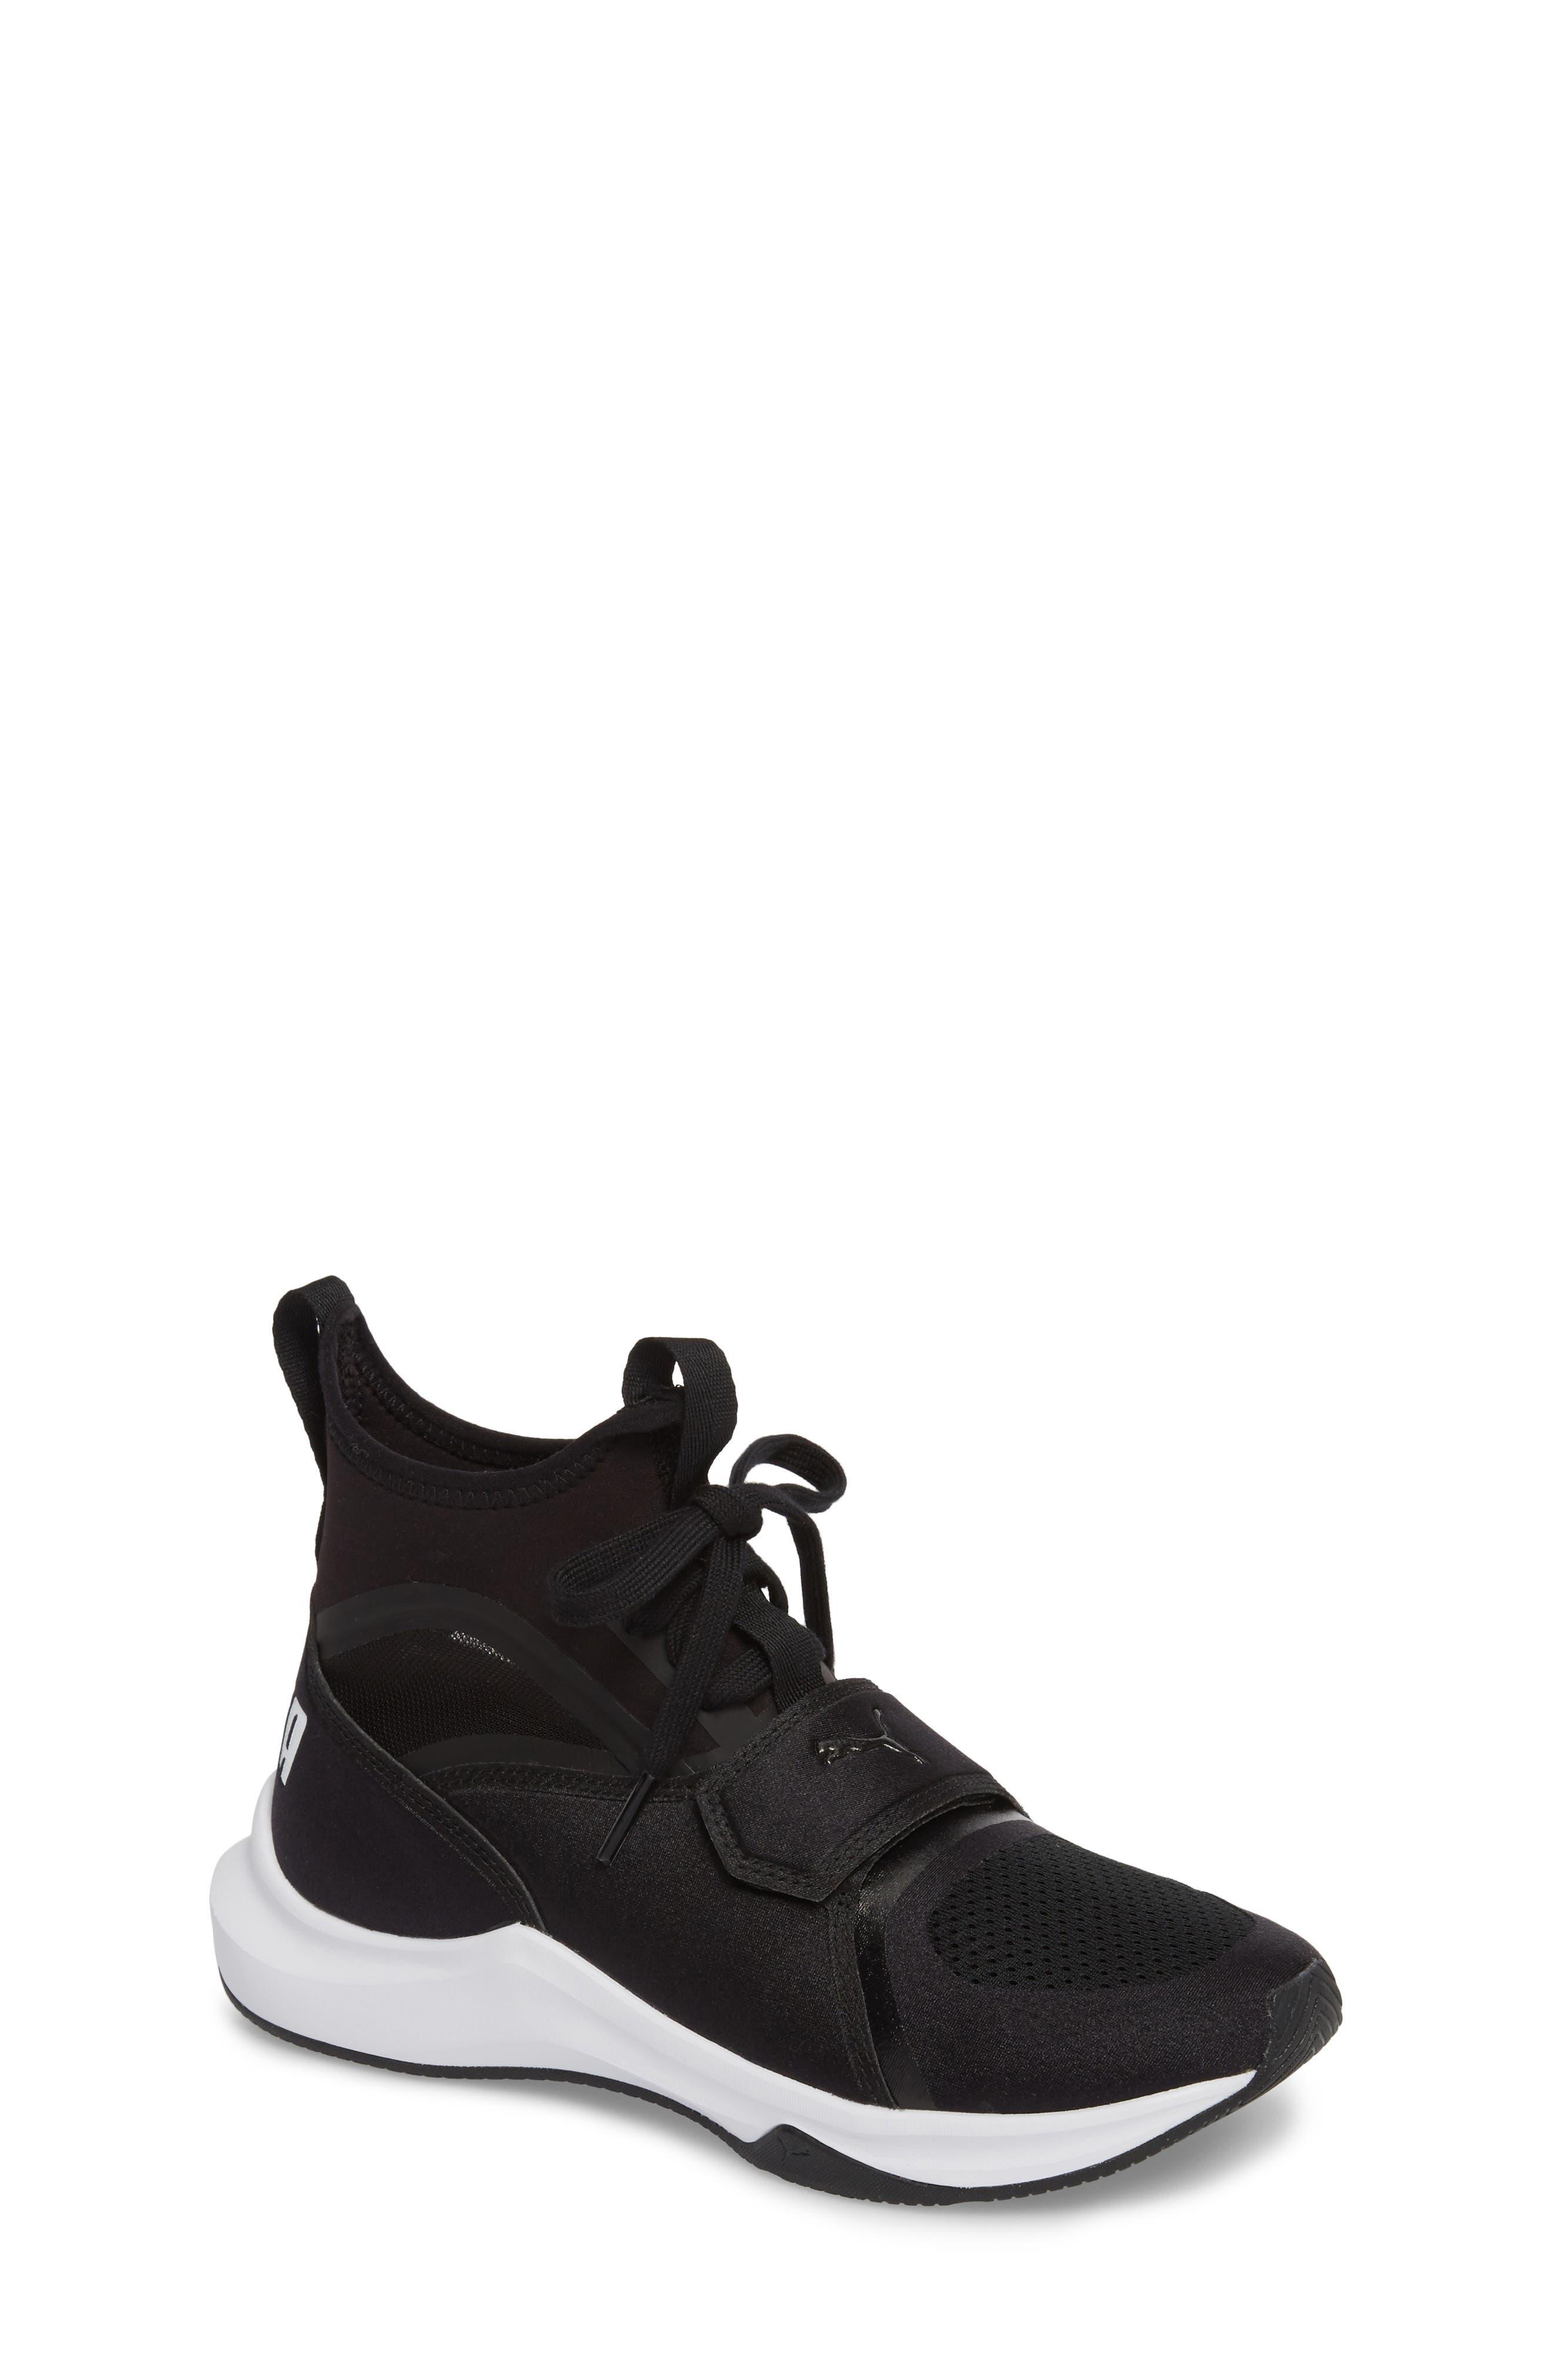 Phenom Jr High Top Sneaker,                             Main thumbnail 1, color,                             Puma Black/ Puma White